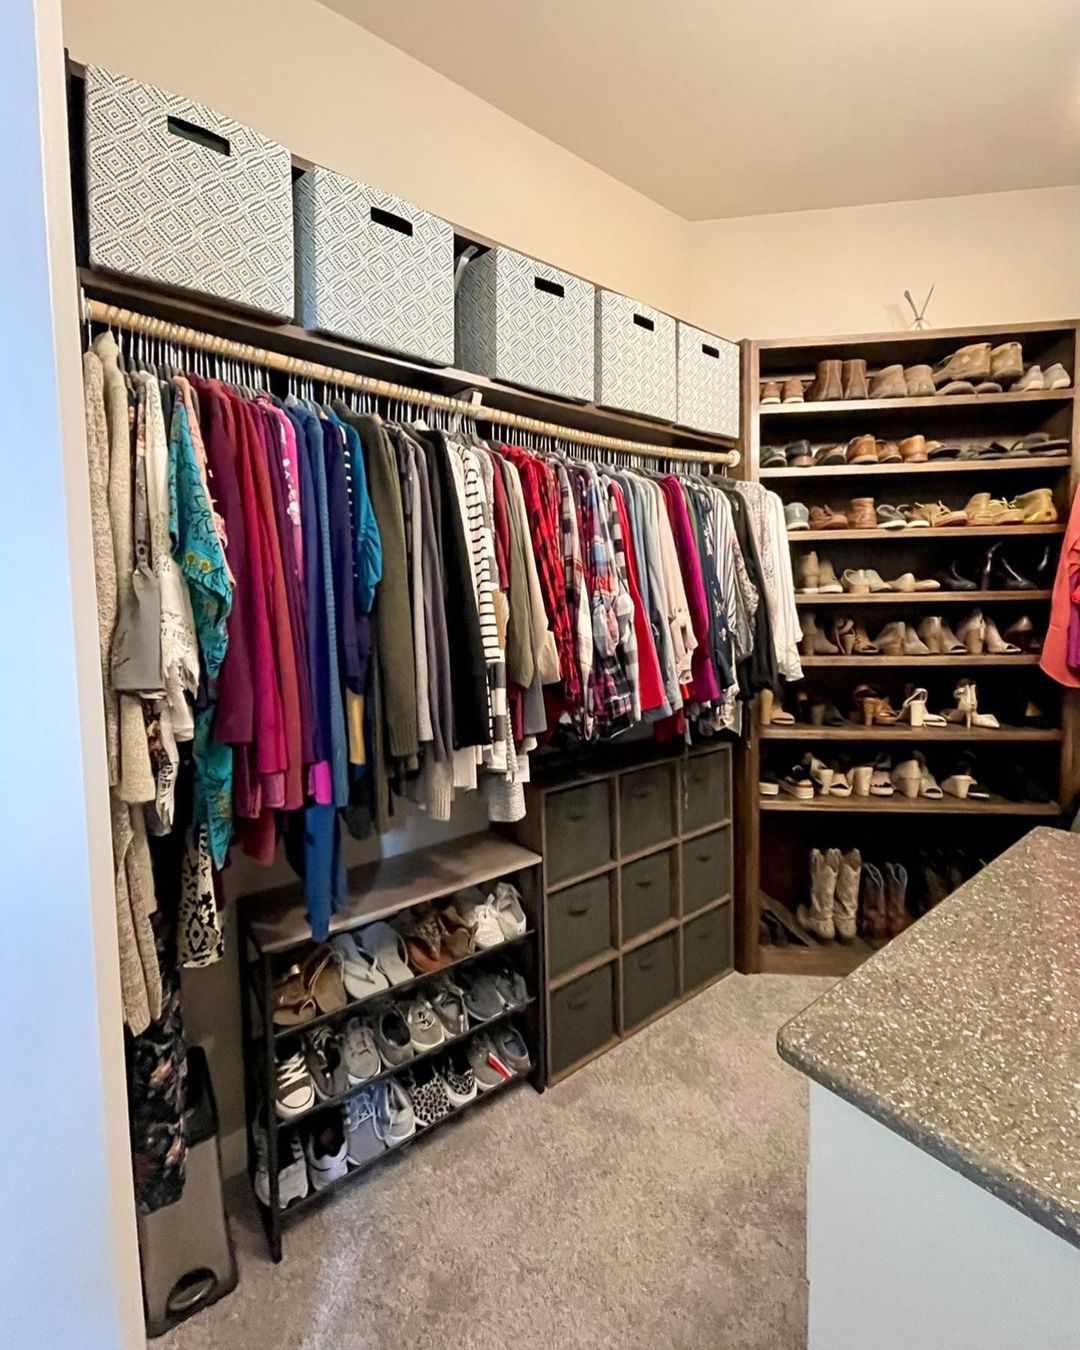 Closet with bins